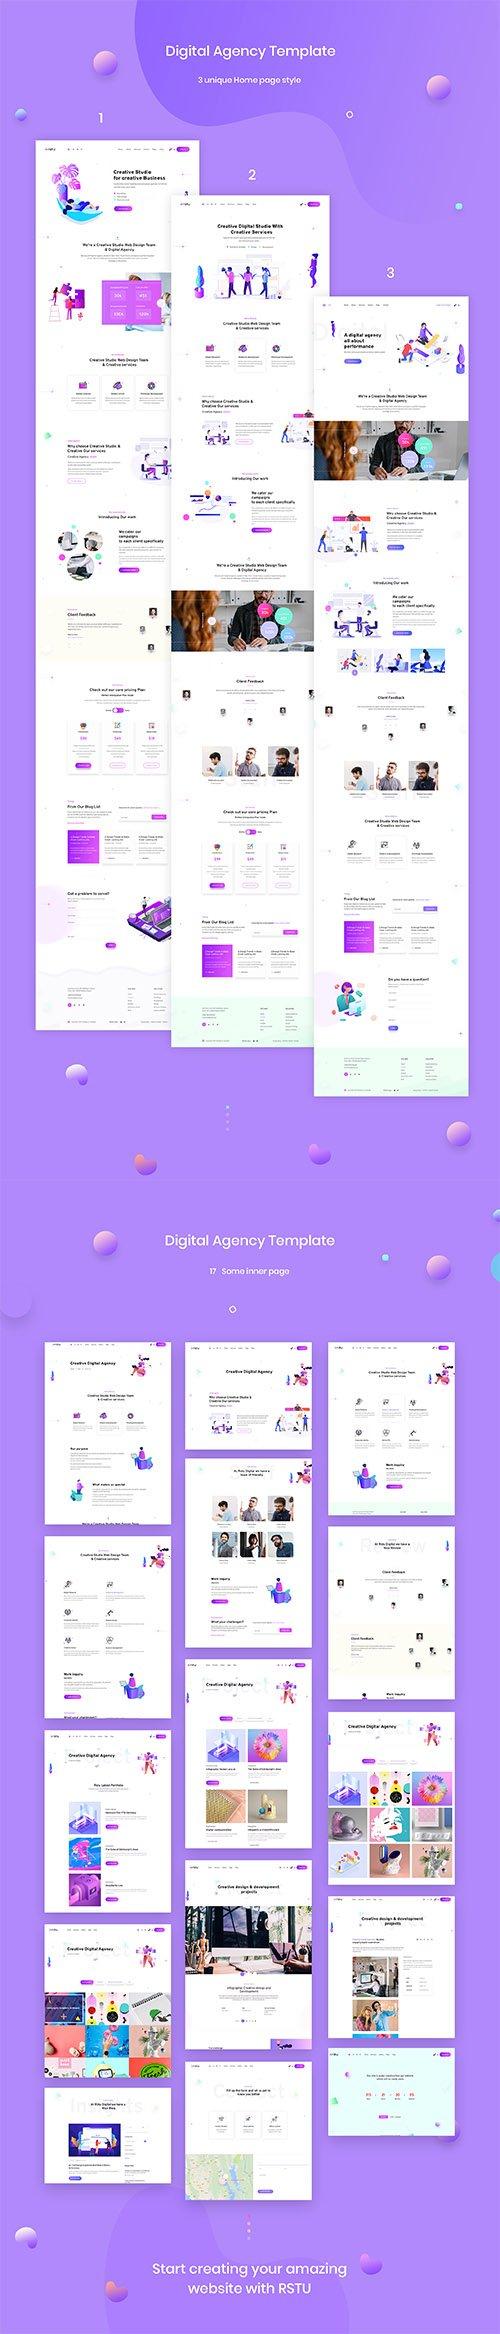 Creative Digital Agency Template